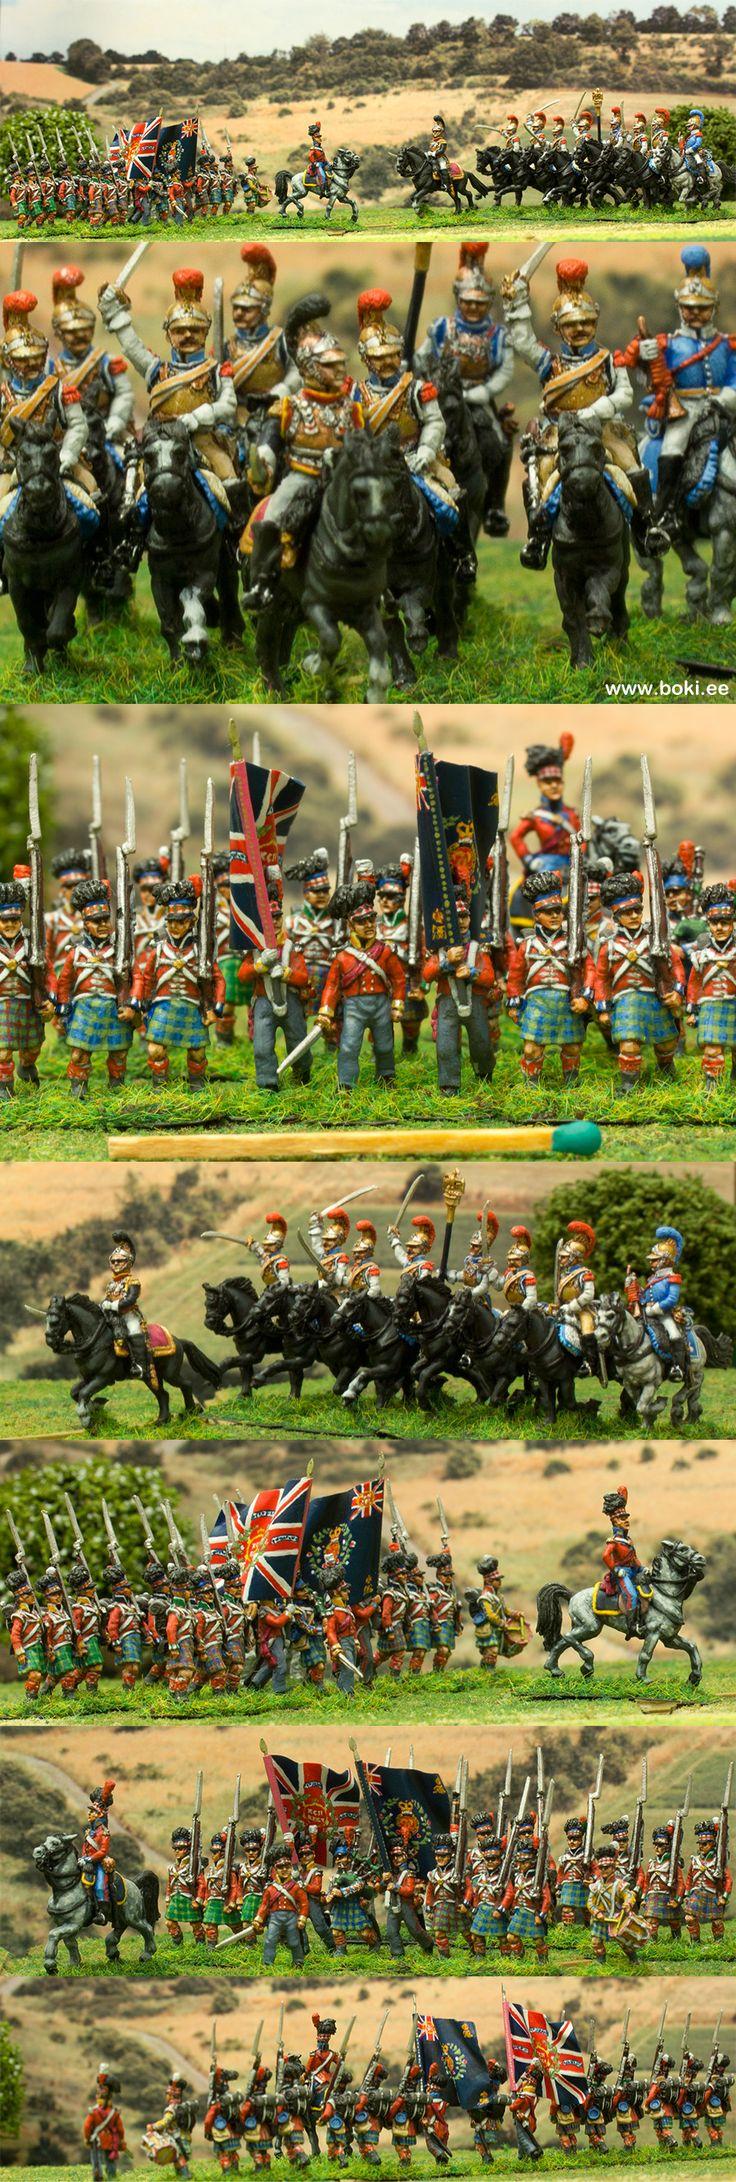 Benno's Figures Forum • My Waterloo 1815 and Borodino 1812 Galleries